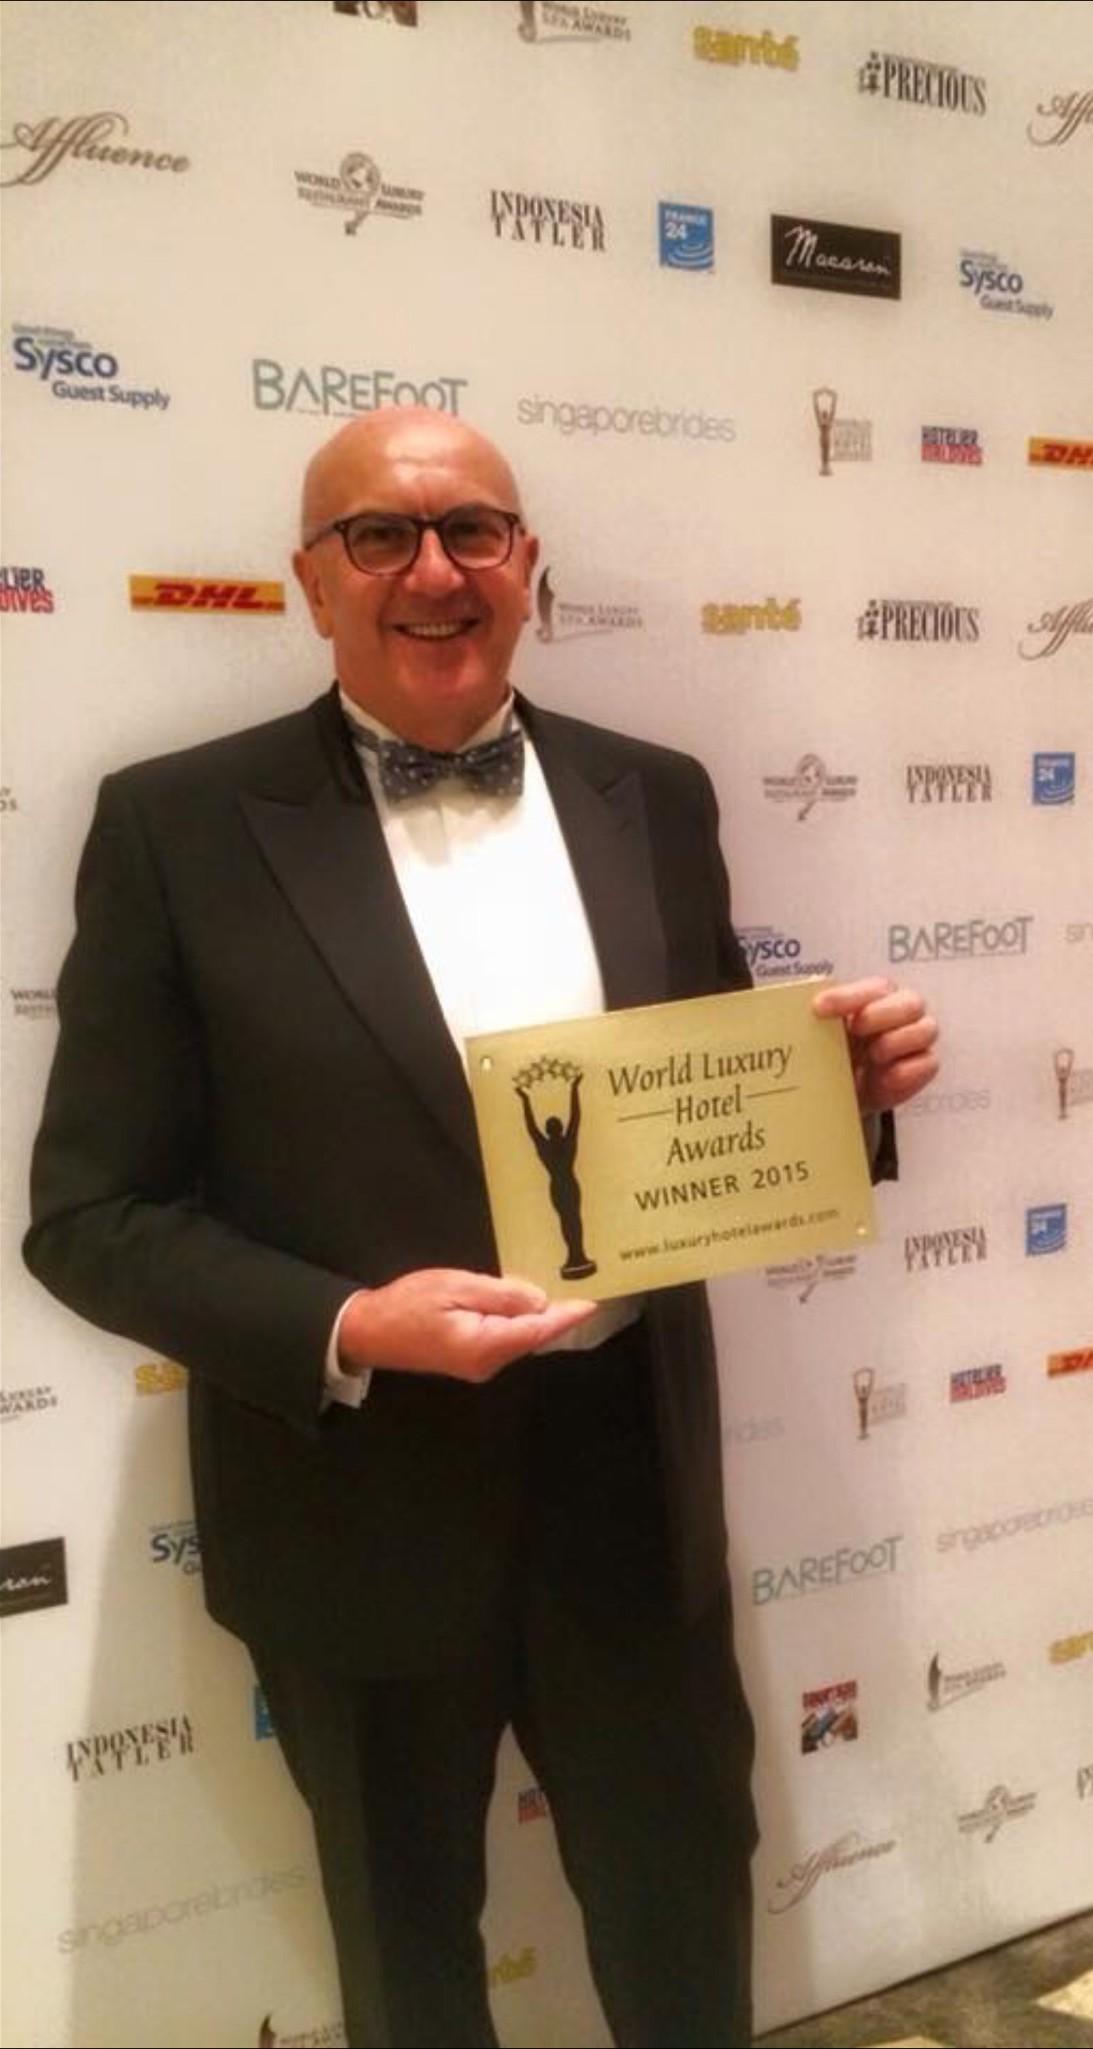 World Luxury Hotel Awards - Byblos Art Hotel has won the 2015 edition - НОВОСТИ И СОБЫТИЯ